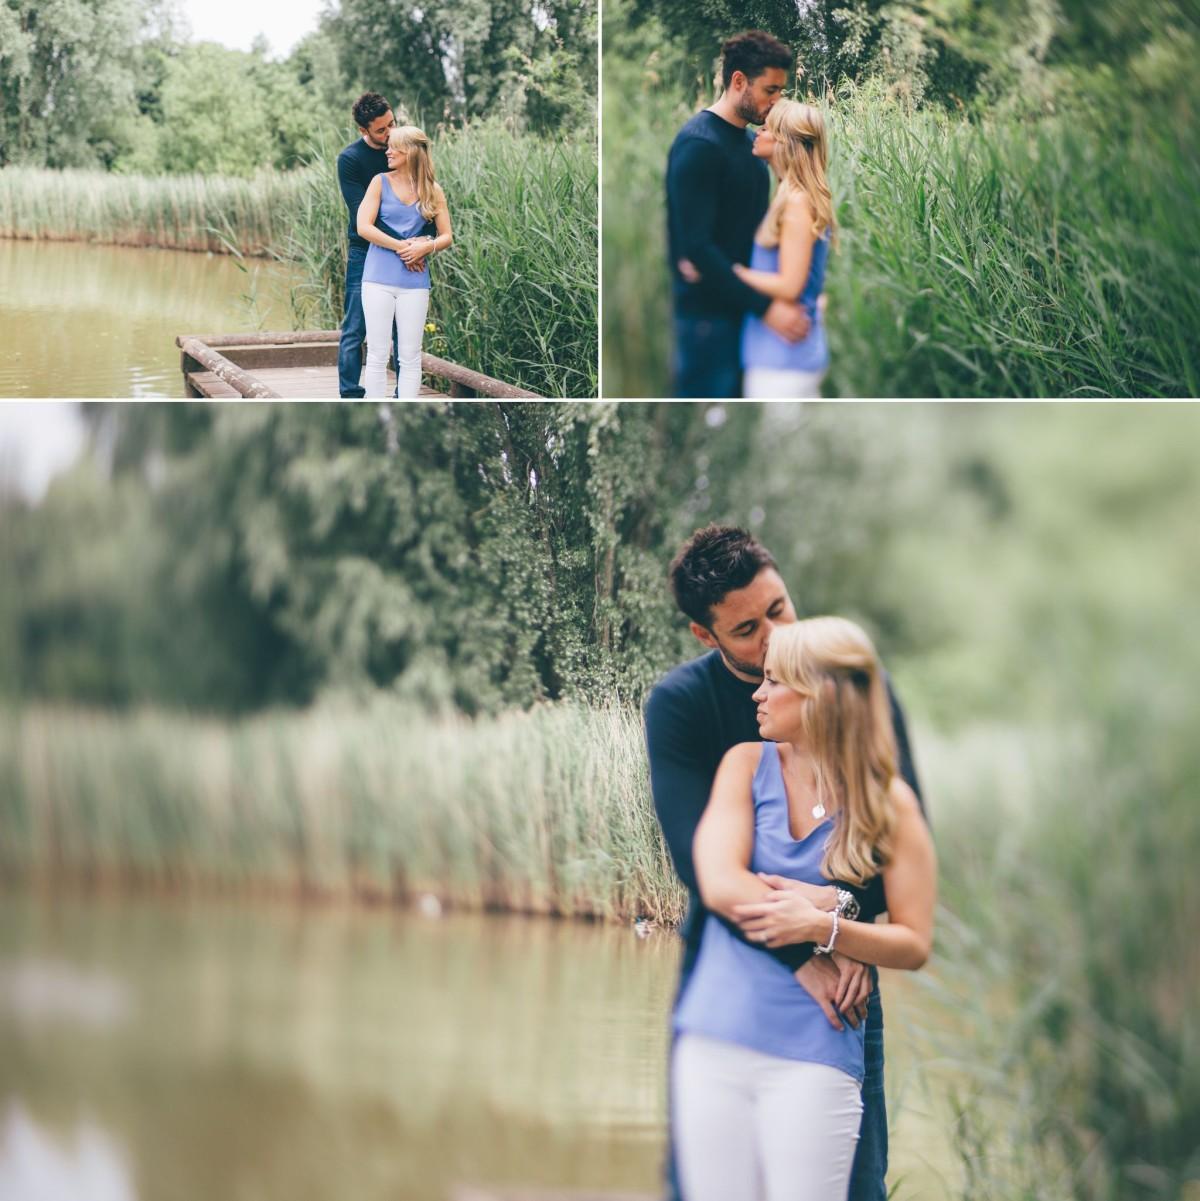 rachel_lambert_photography_welsh_wedding_photographer_harriet_dean_engagement_shoot_caldicot_castle_lower_slaughter_manor_house_ 9